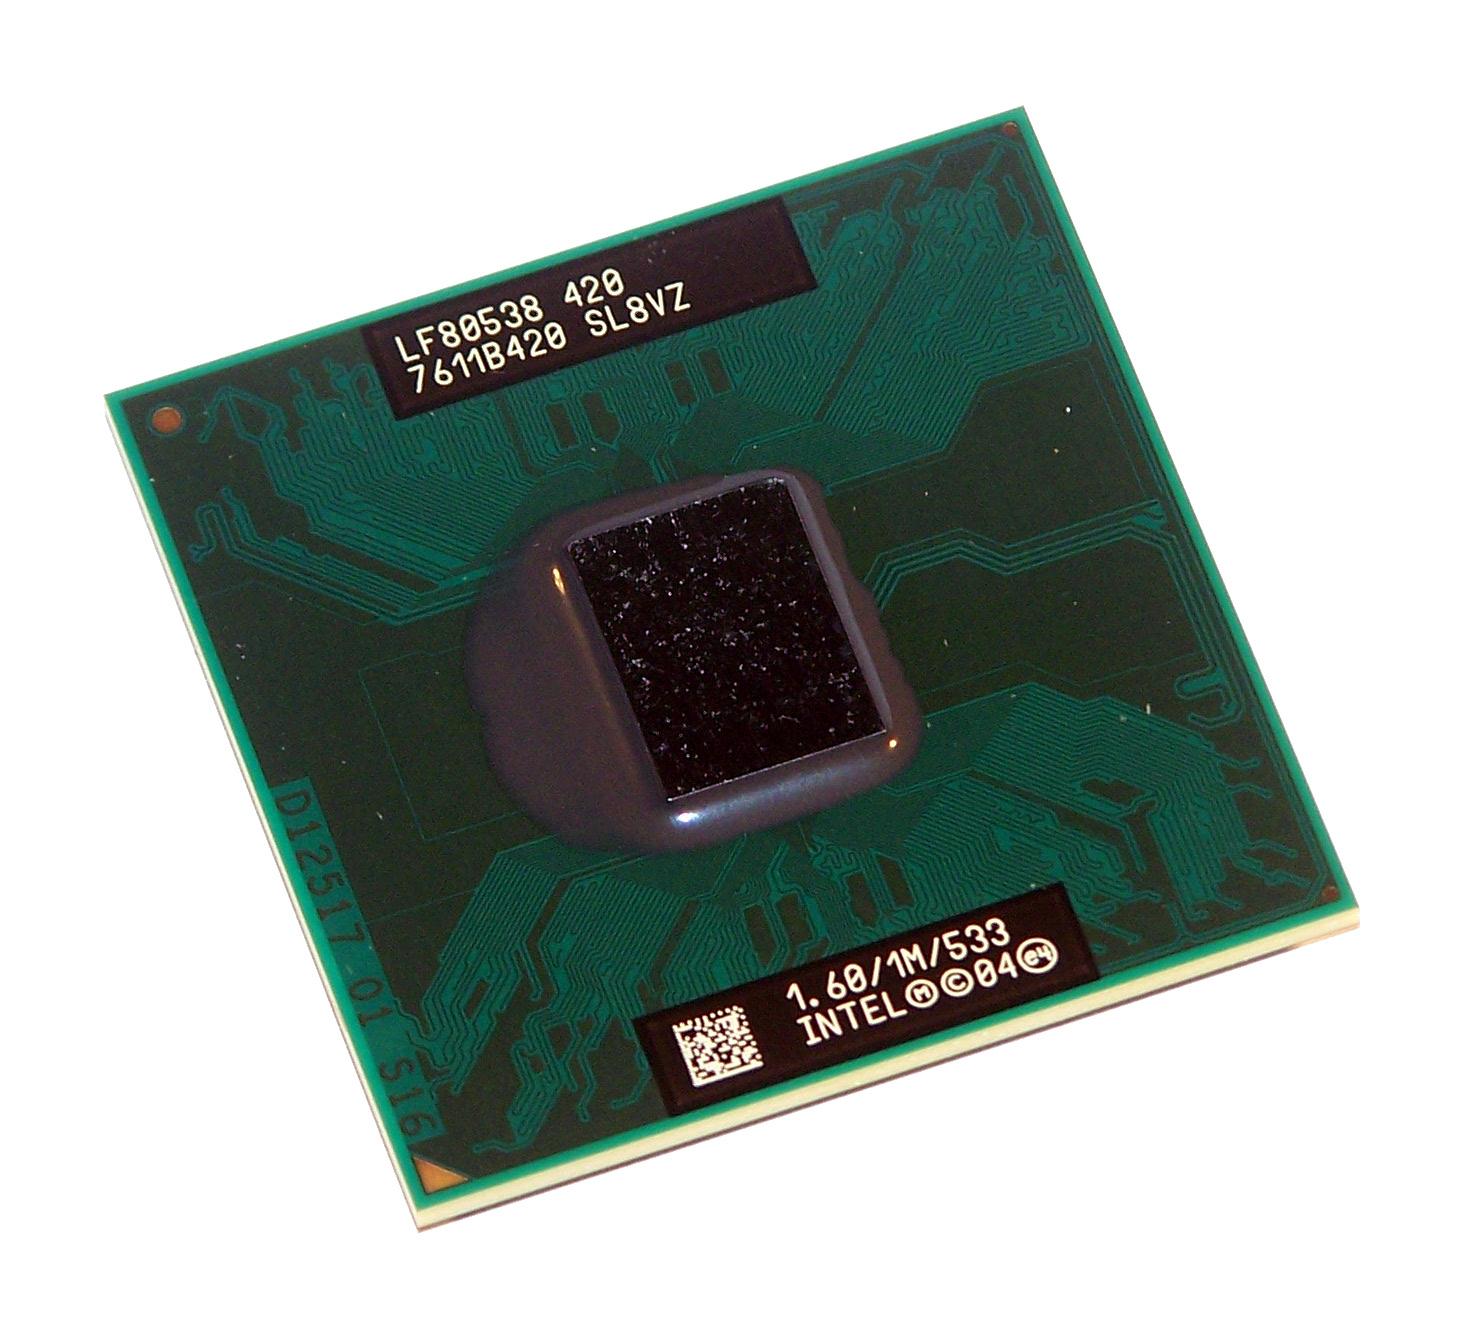 celeron 420_Intel LF80538NE0251M Celeron M 420 1.60GHz Socket M Processor SL8VZ 735858189323 | eBay